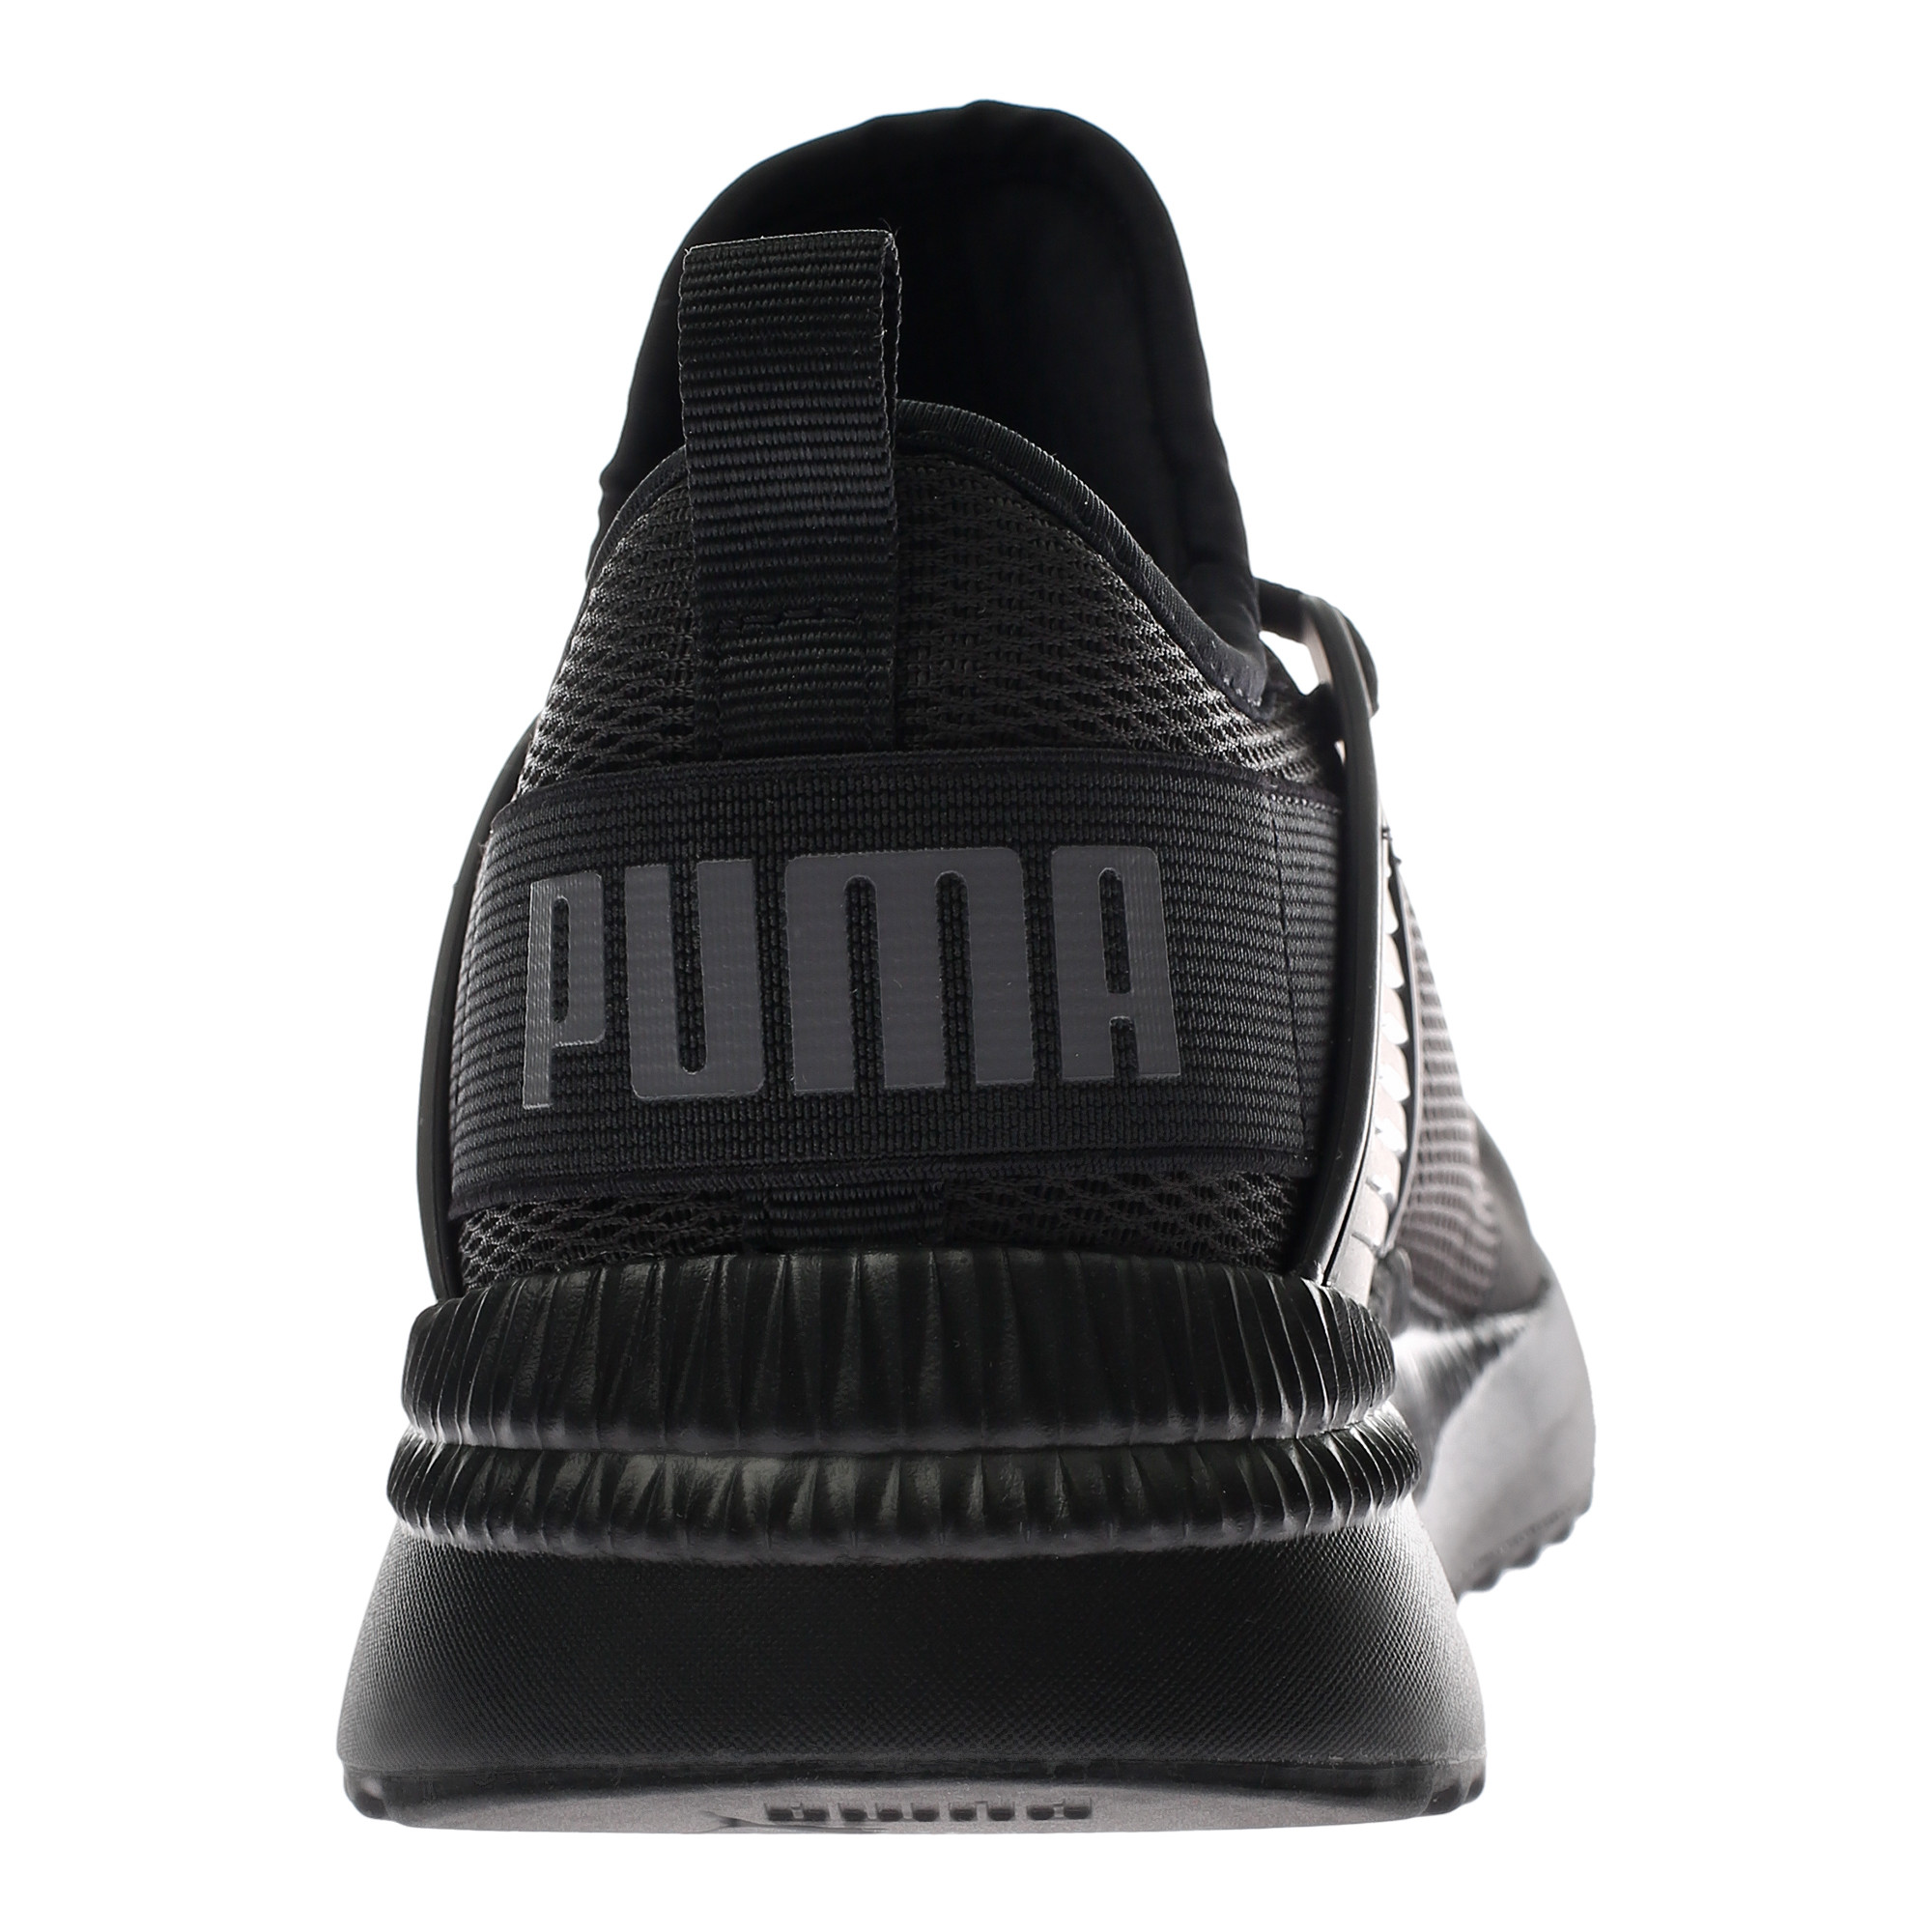 PUMA-Pacer-Next-Cage-Sneakers-JR-Boys-Shoe-Kids thumbnail 3